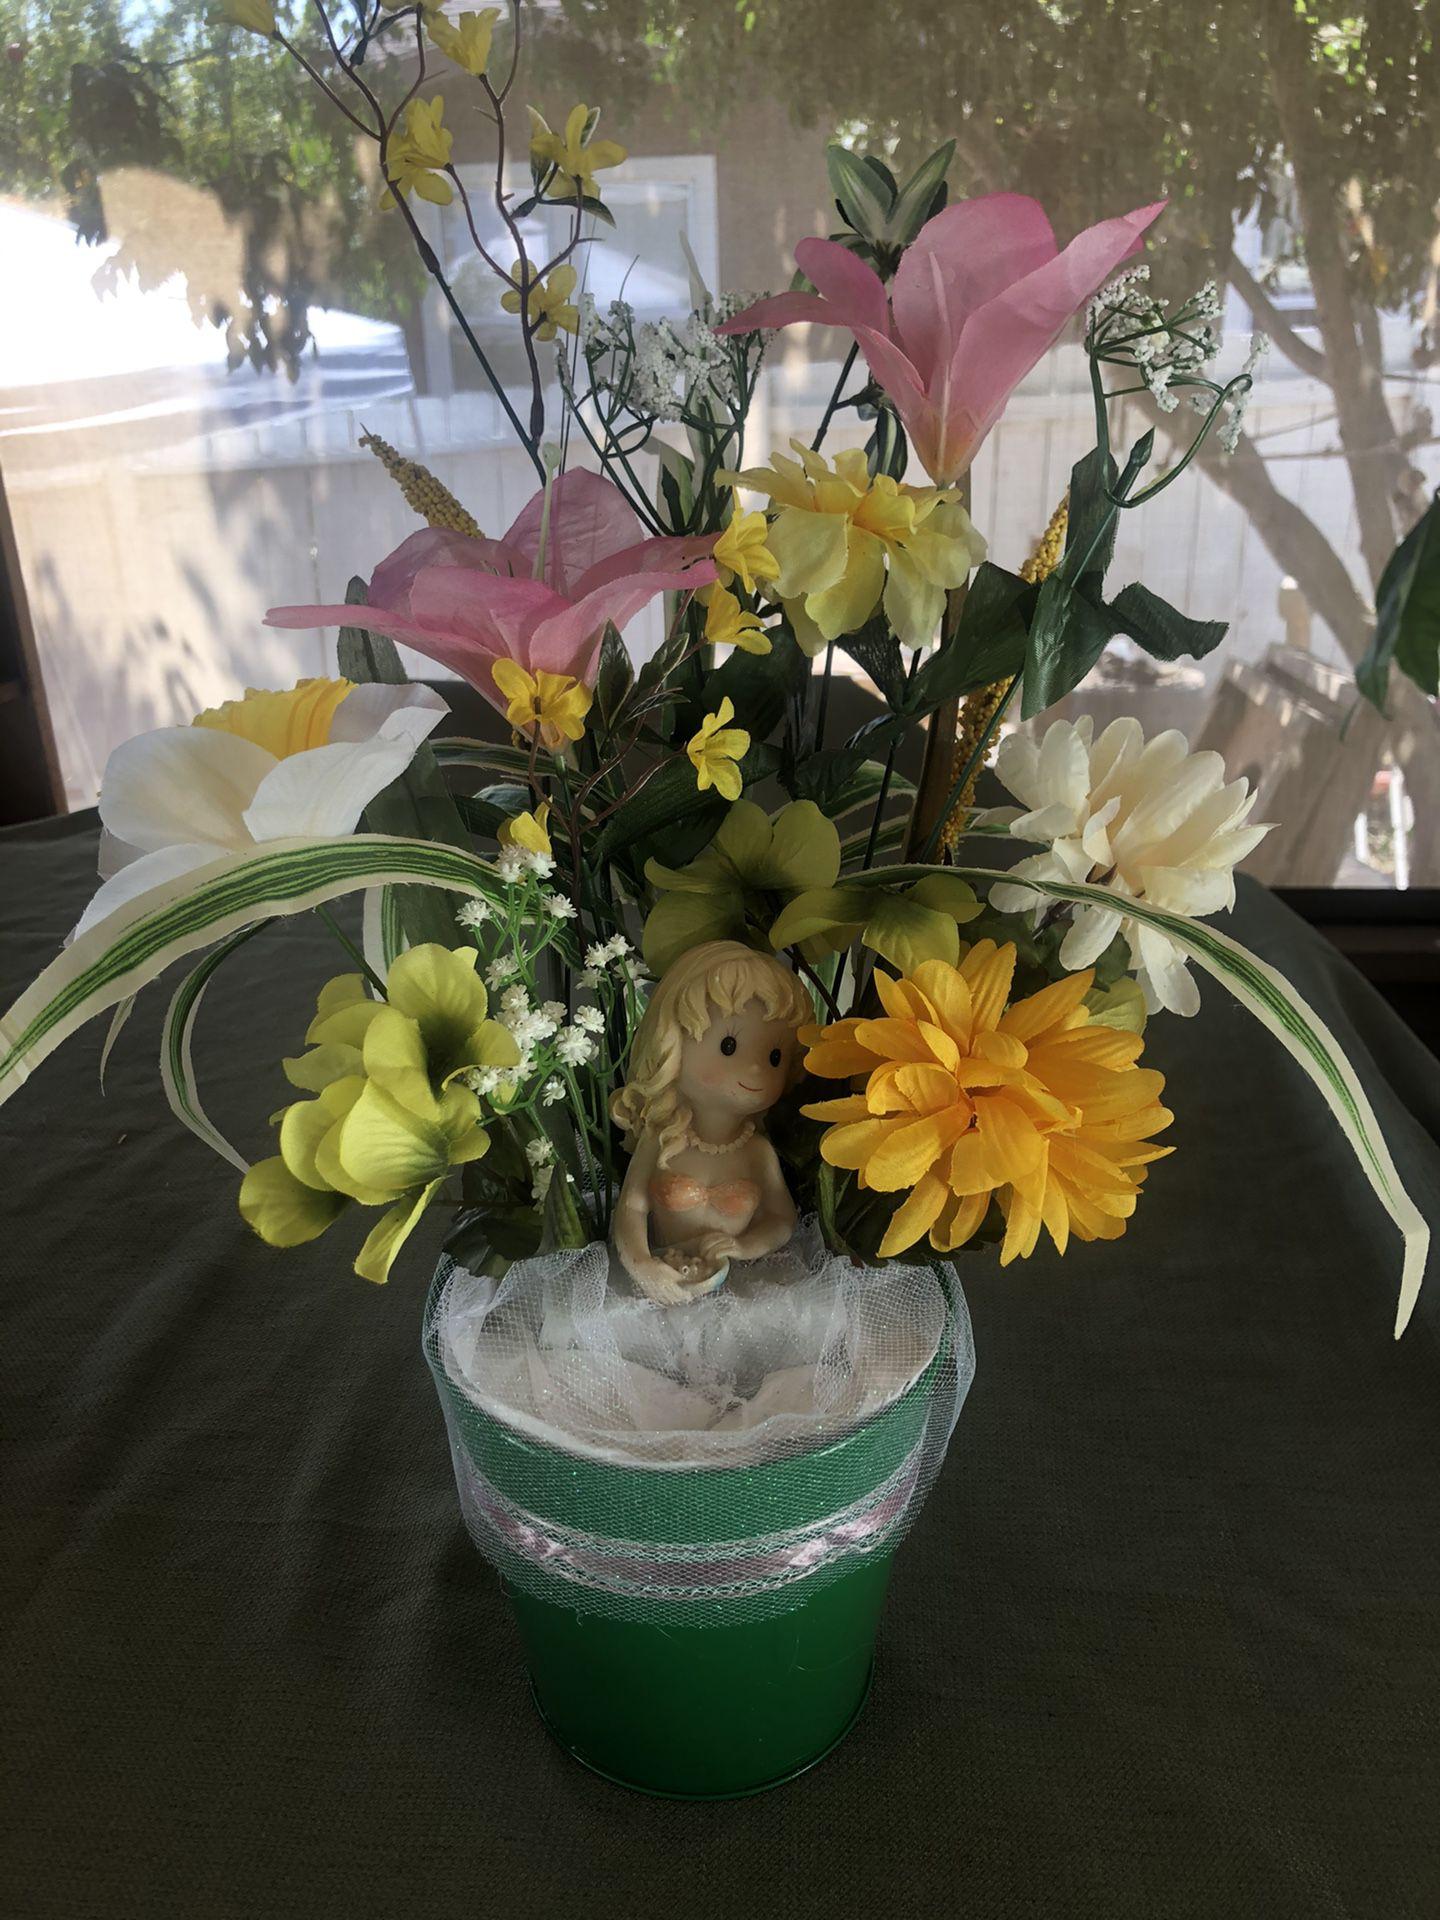 Brand new flower arrangement